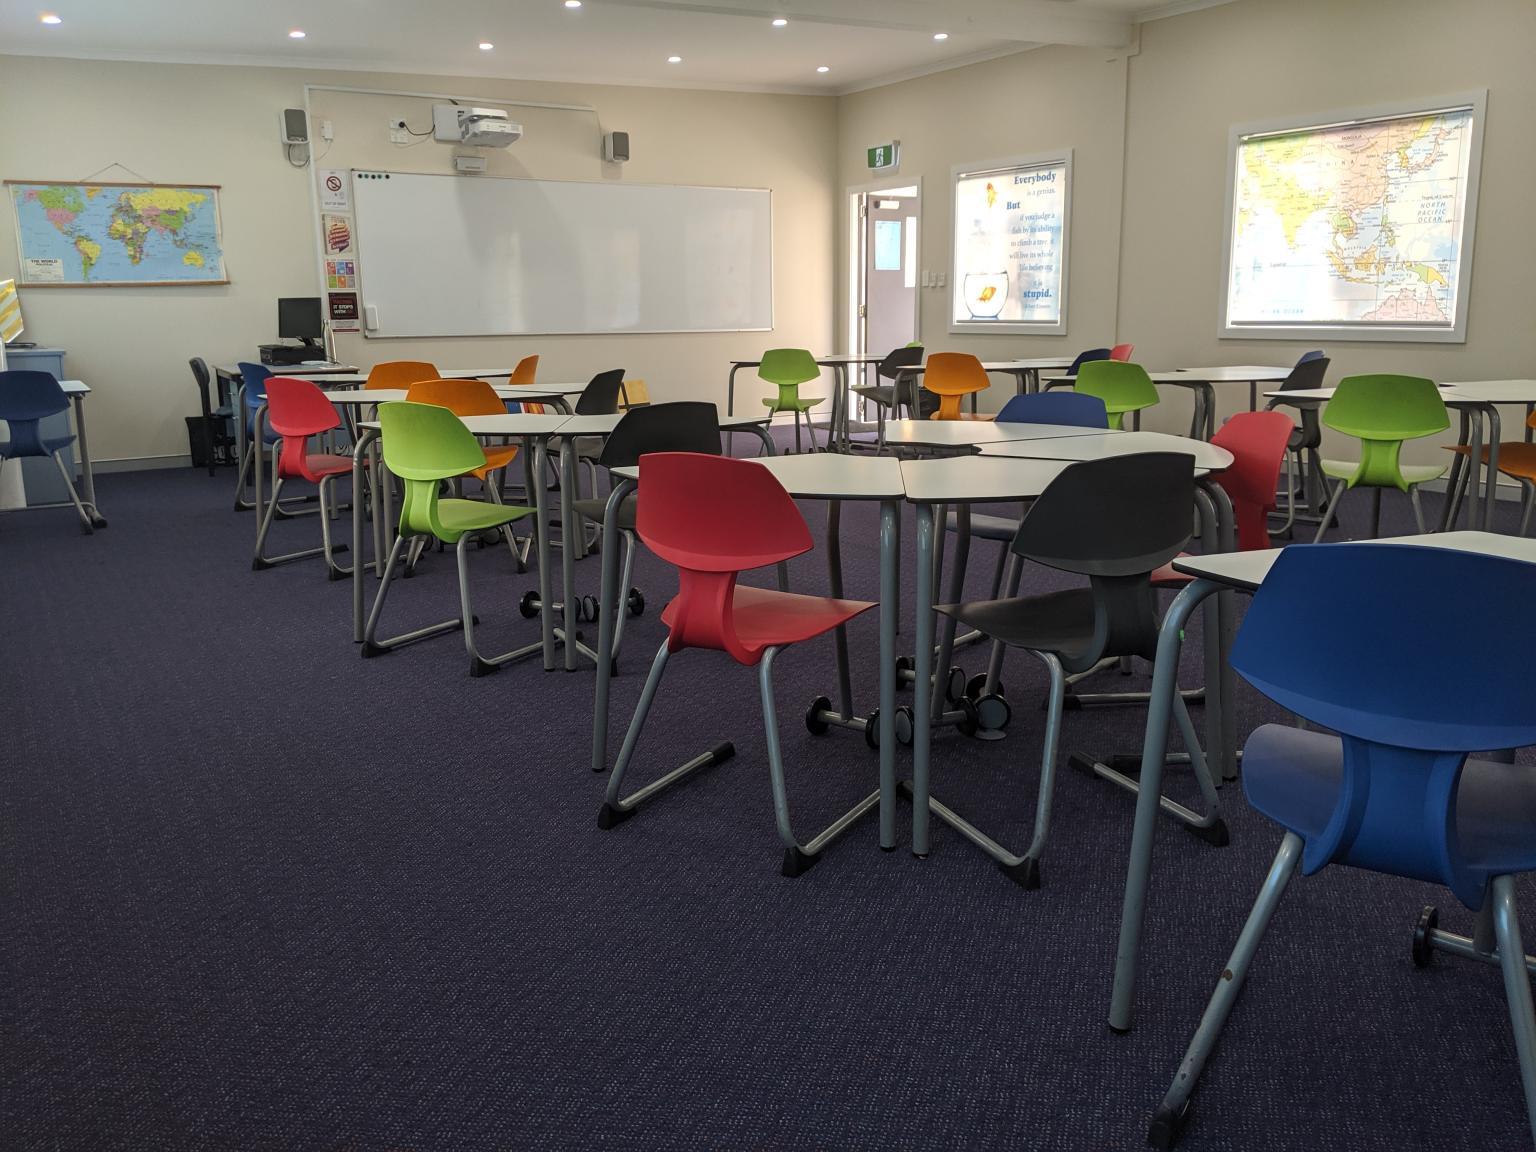 demountable classroom desks